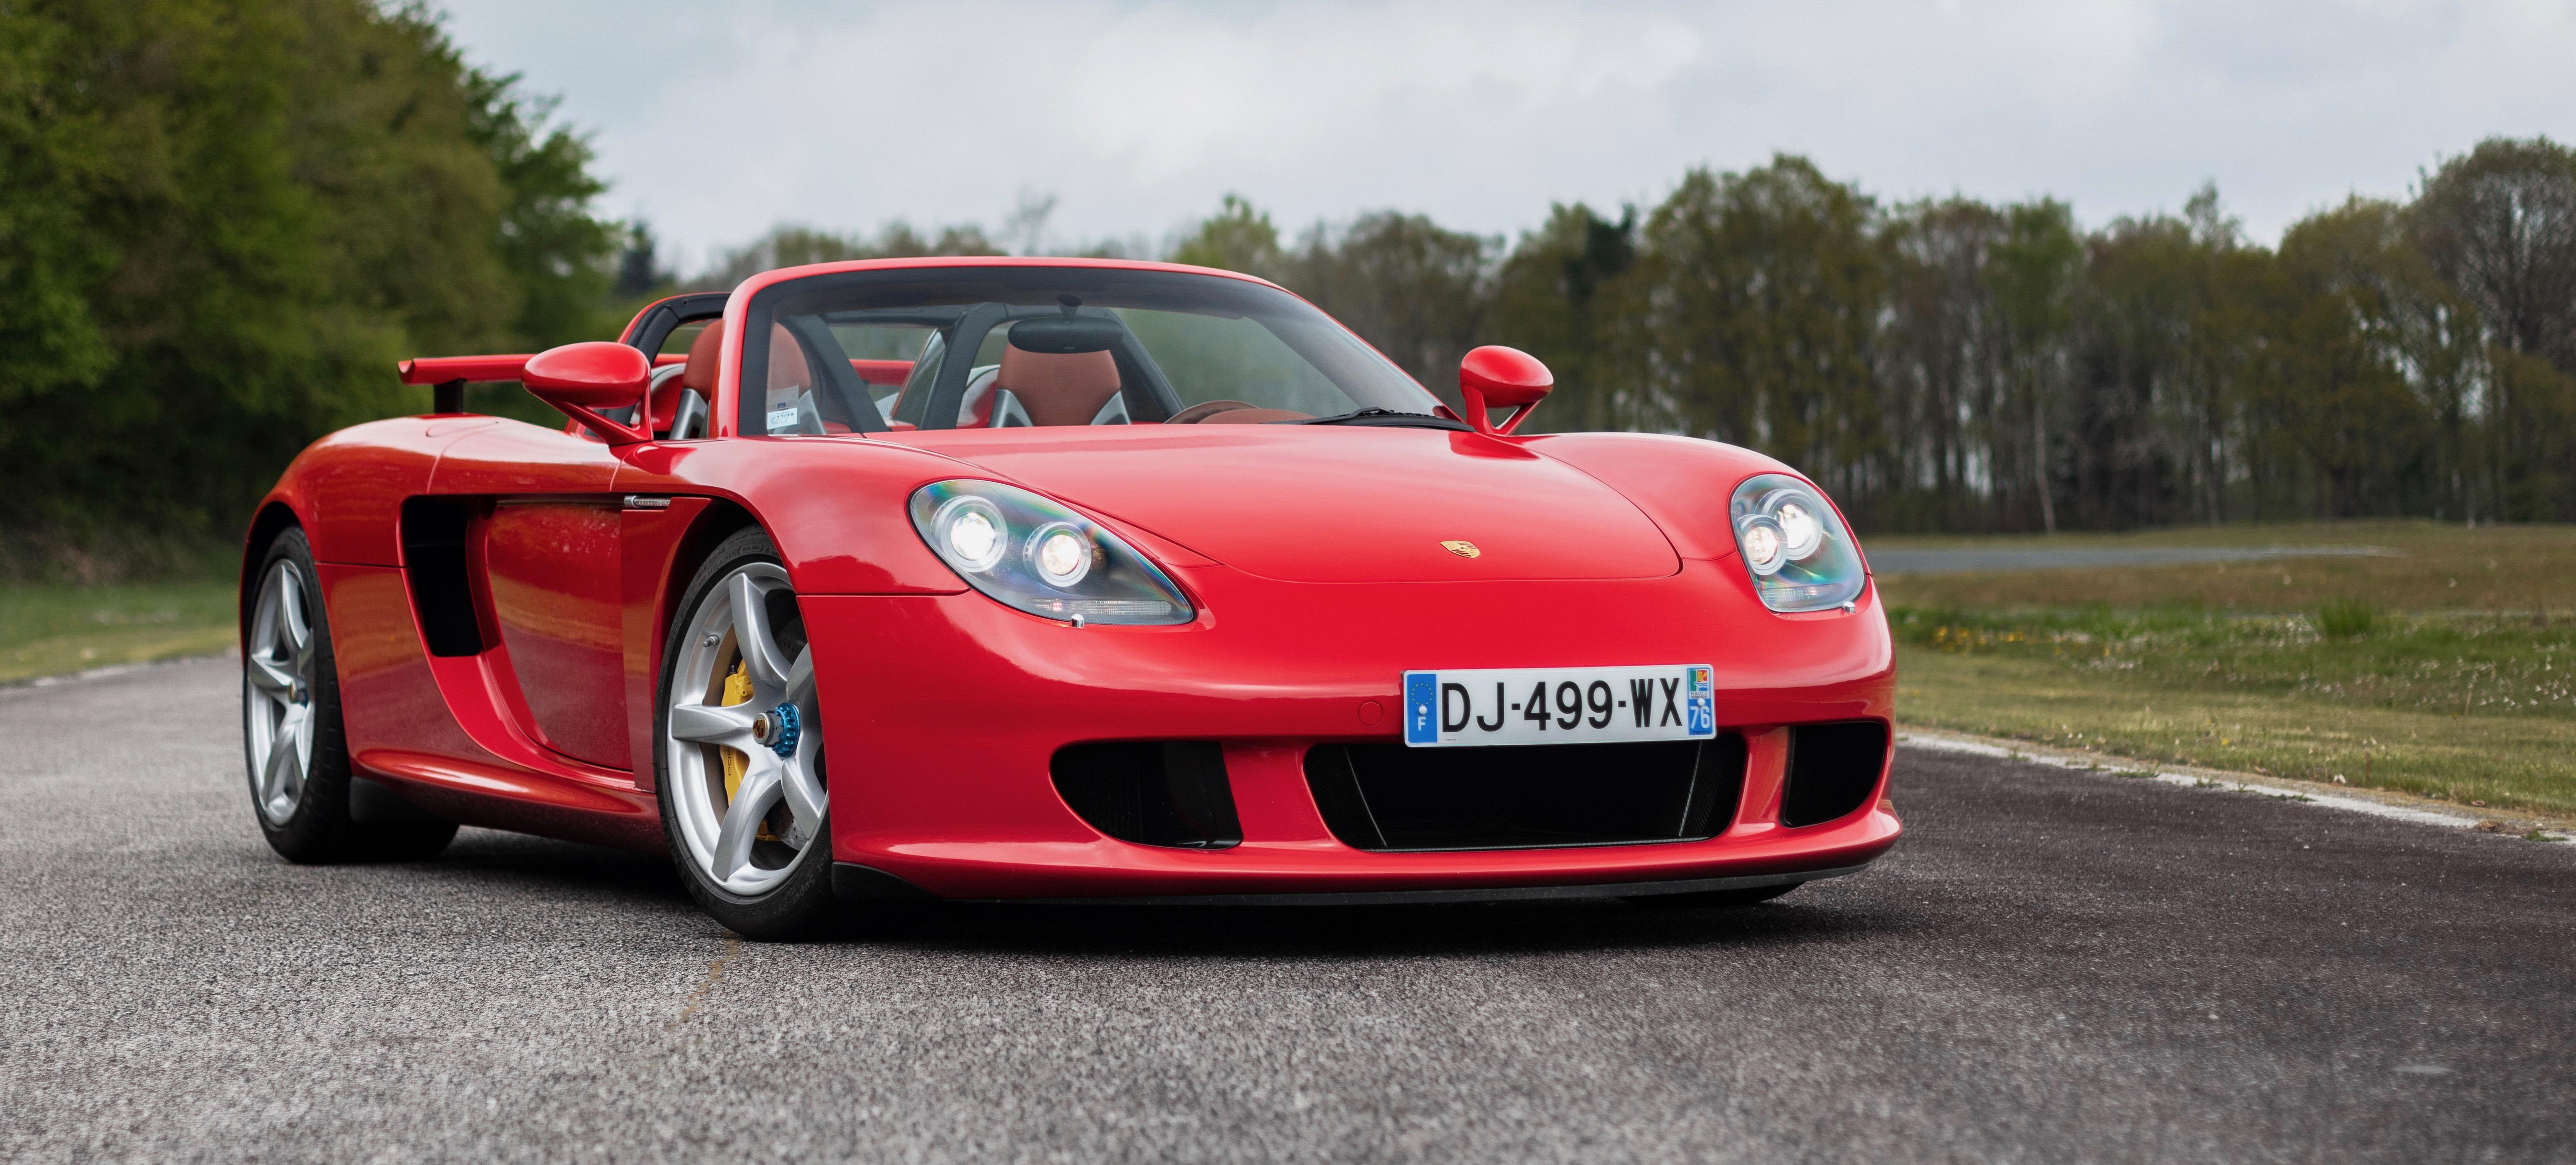 Ferrari, 1965 Ferrari 275 GTB tops Artcurial auction in Paris, ClassicCars.com Journal